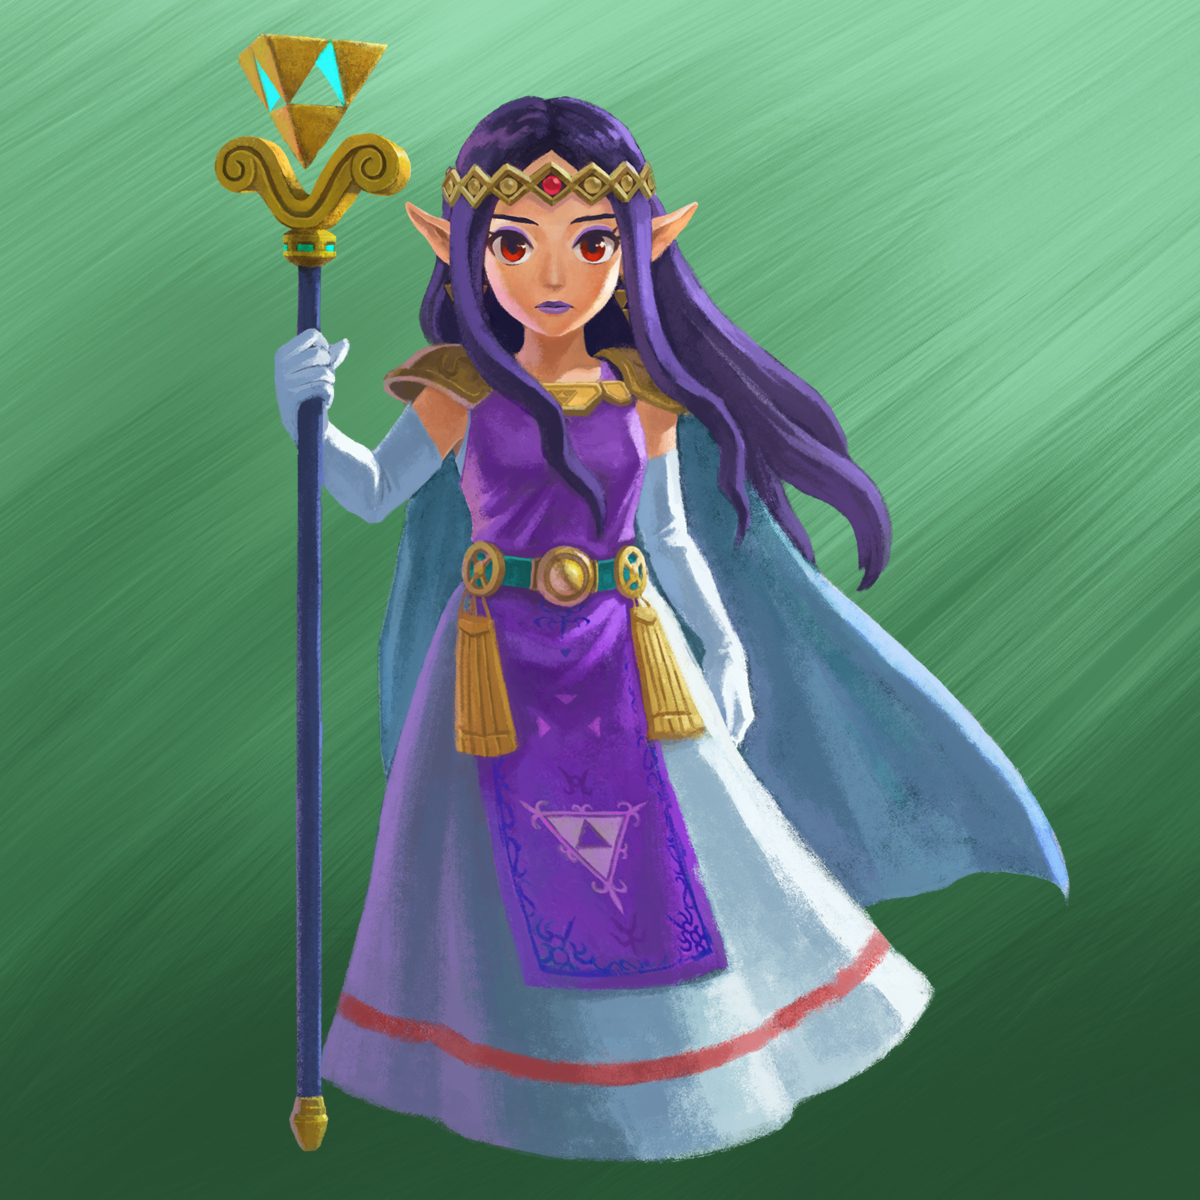 ⌠Post Oficial⌡ -ⓏⒺⓁⒹⒶ- The Legend of Zelda: A Link Between Worlds -ⓏⒺⓁⒹⒶ- - Página 2 1381521071-hilda-from-lorule